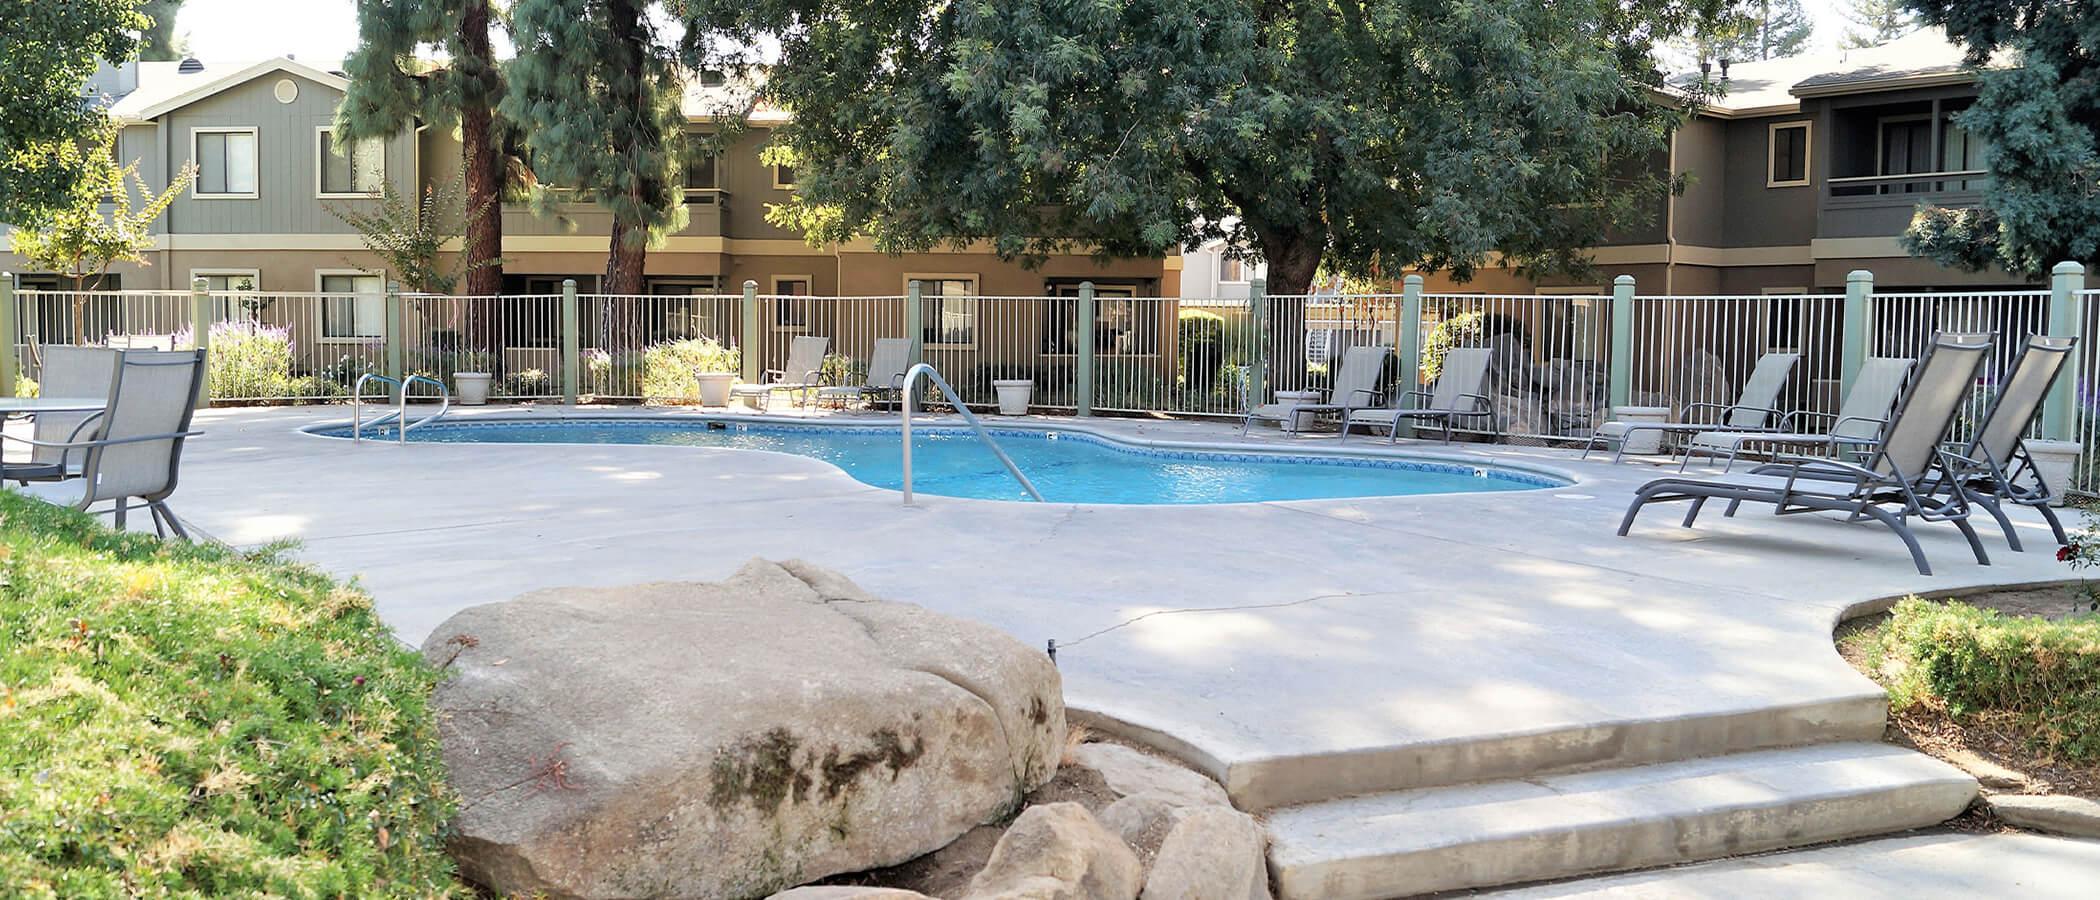 Best Apartments In Fresno Ca